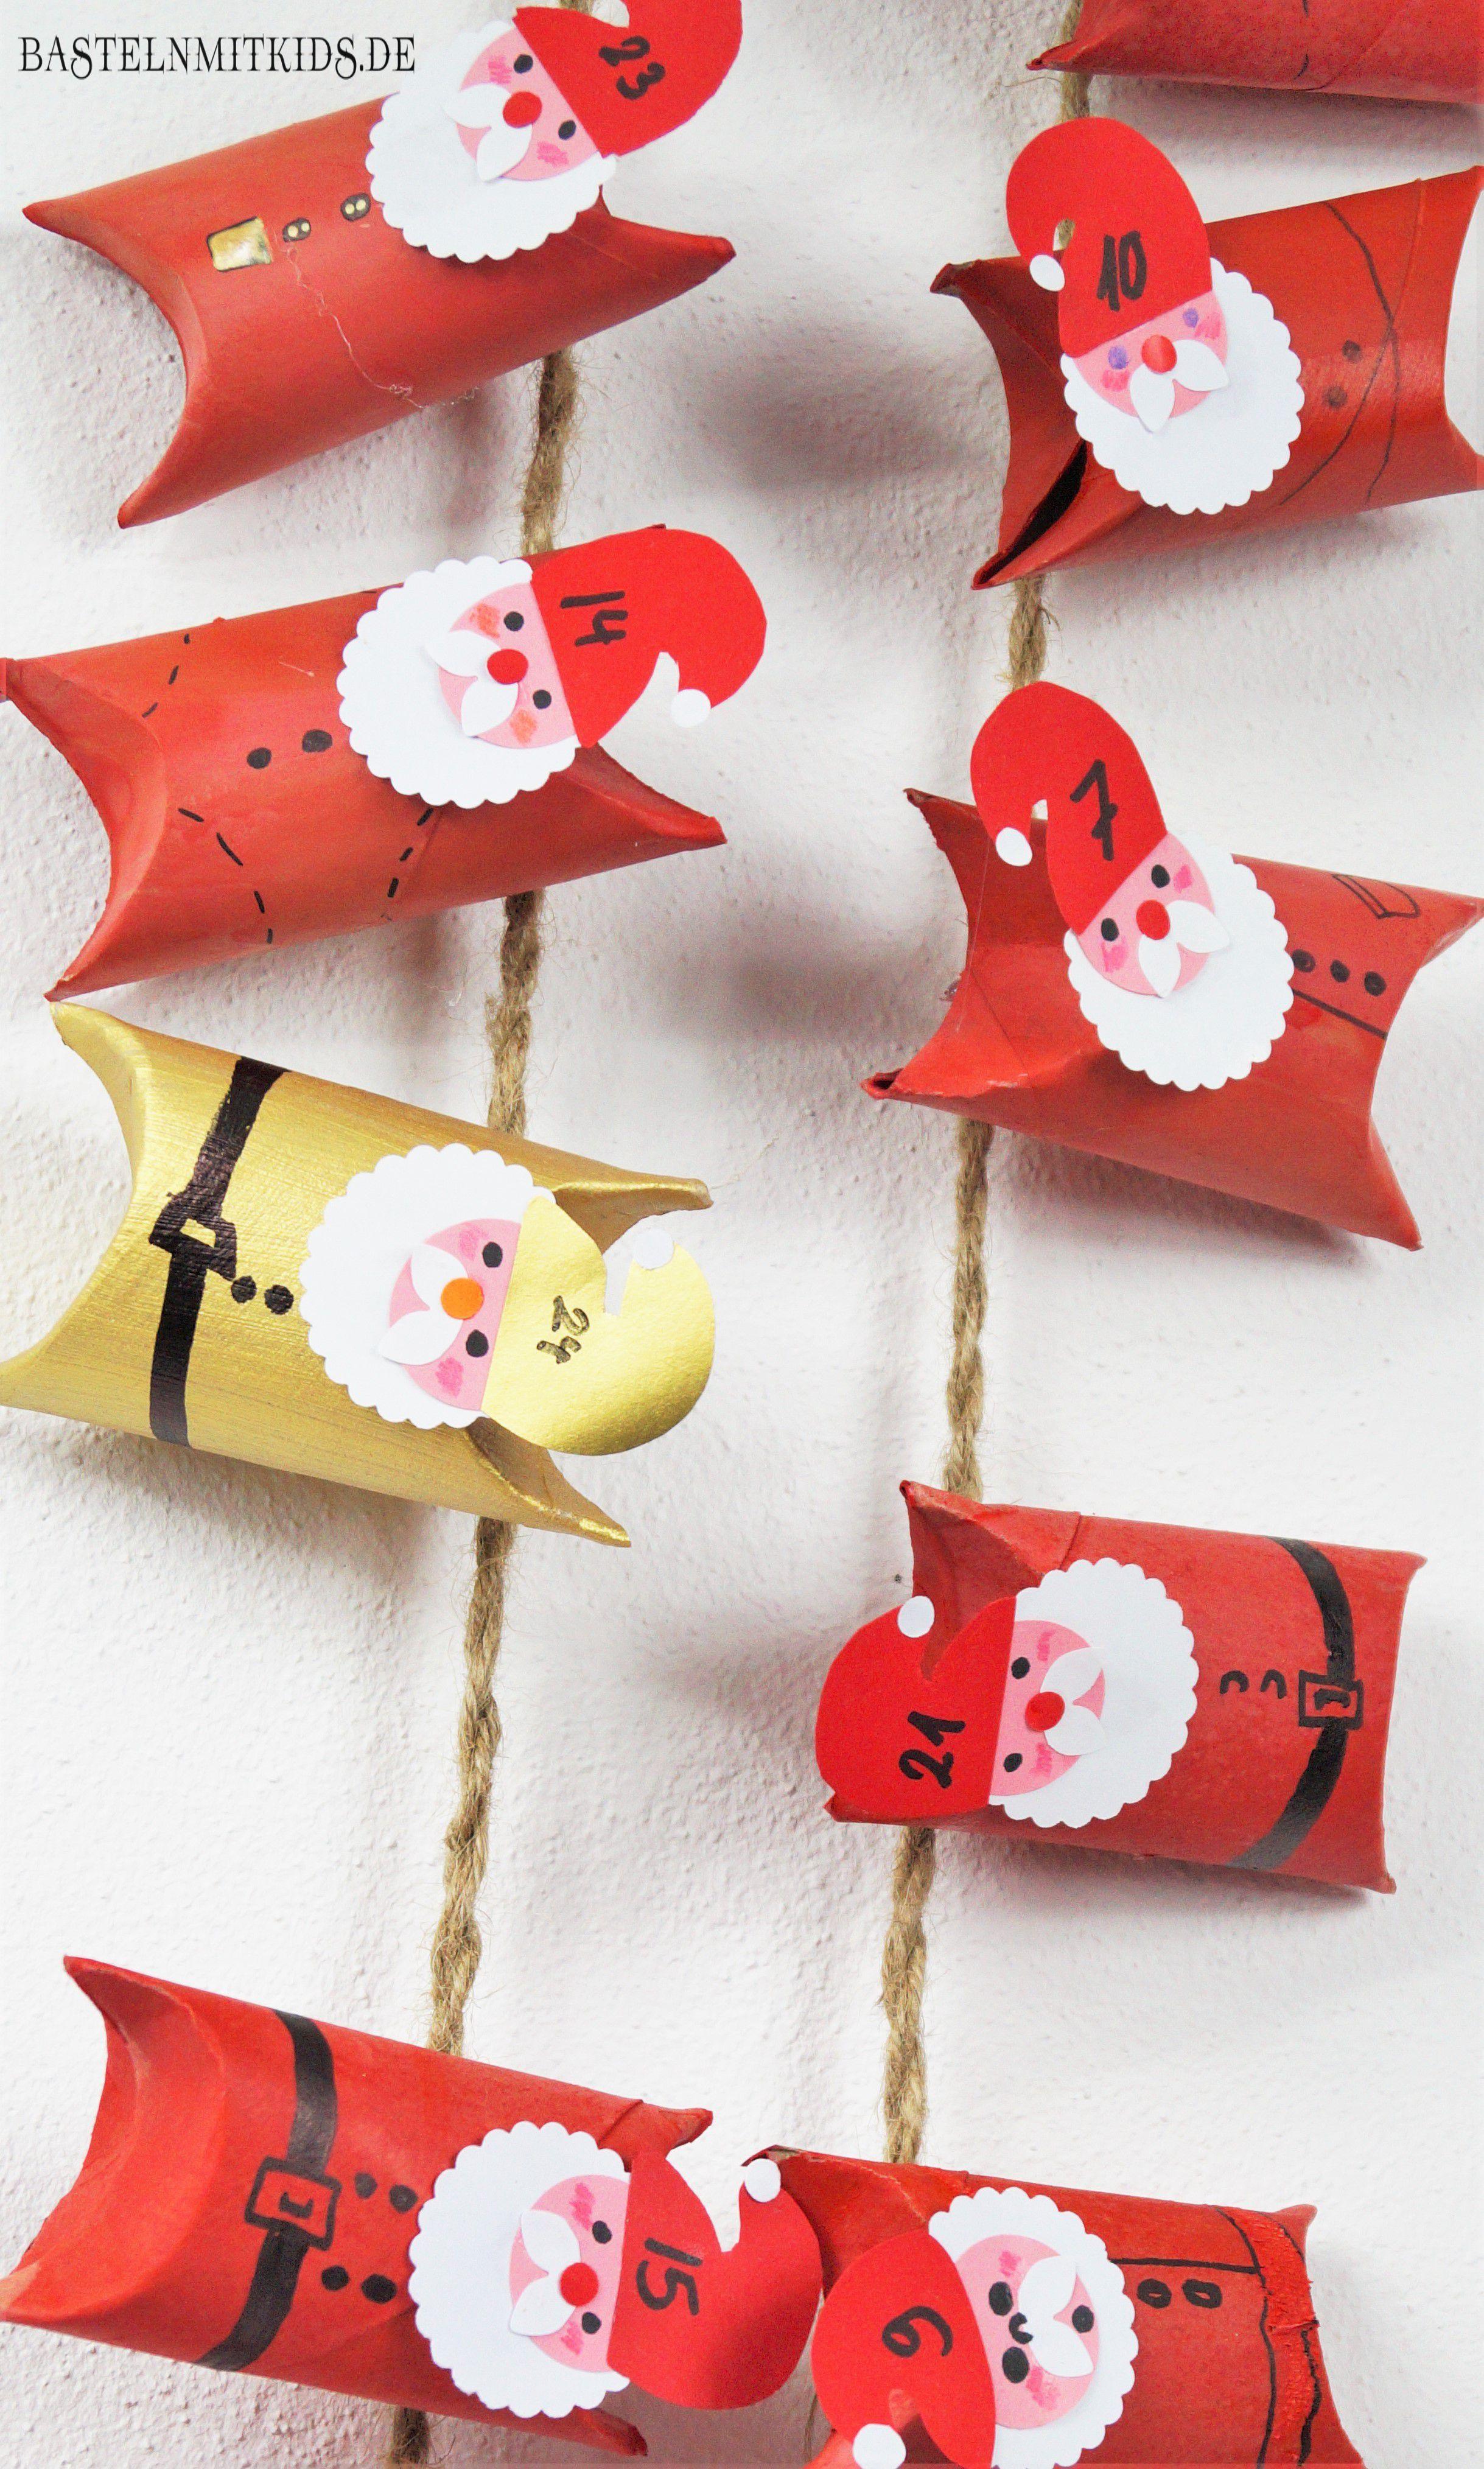 Basteln Mit Kindern Adventskalender Selber Basteln Mit Klopapierrollen Adventskalender Selber Basteln Adventskalender Kinder Basteln Adventkalender Basteln